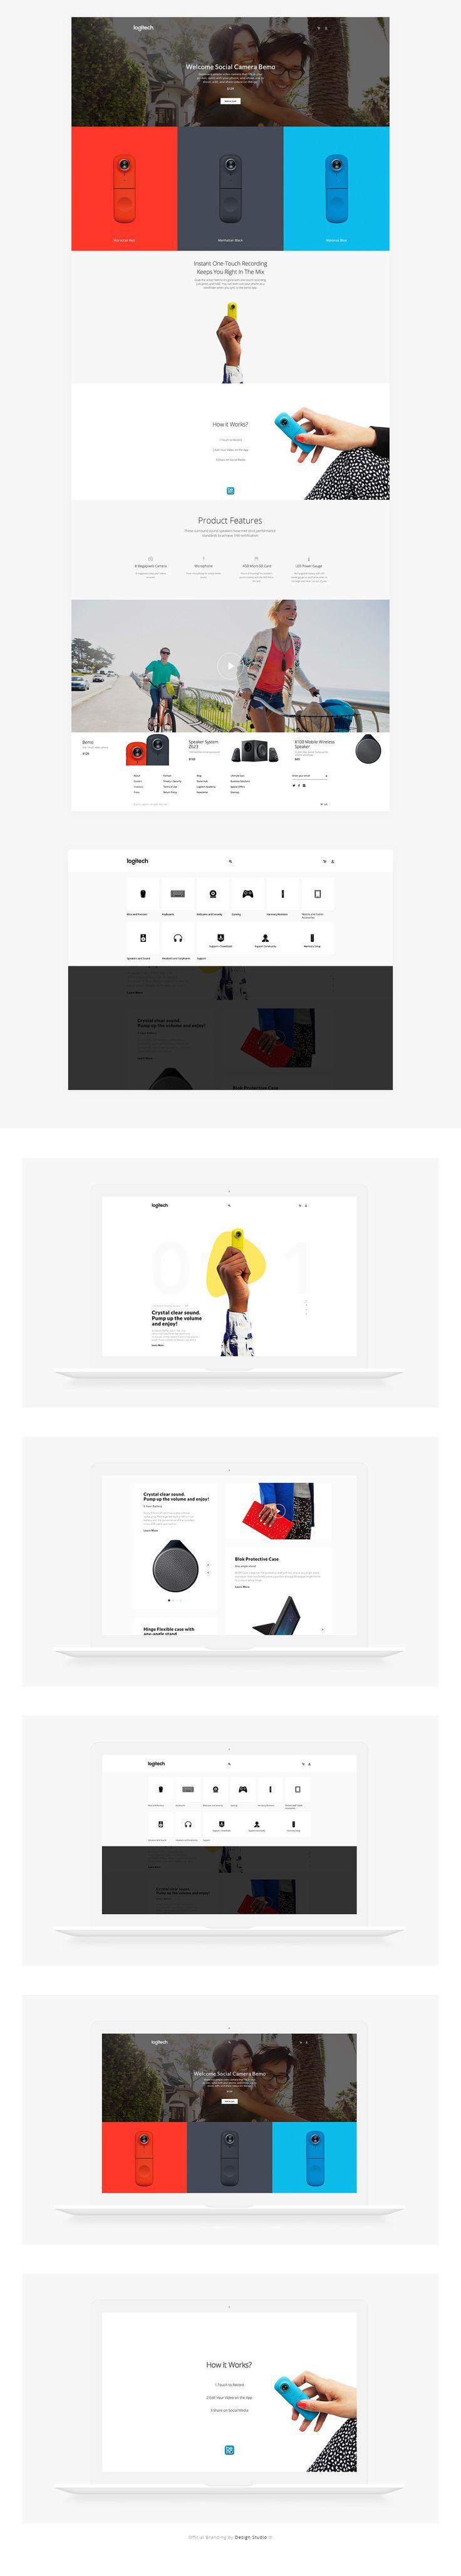 Web Design - Logitech | Abduzeedo Design Inspiration